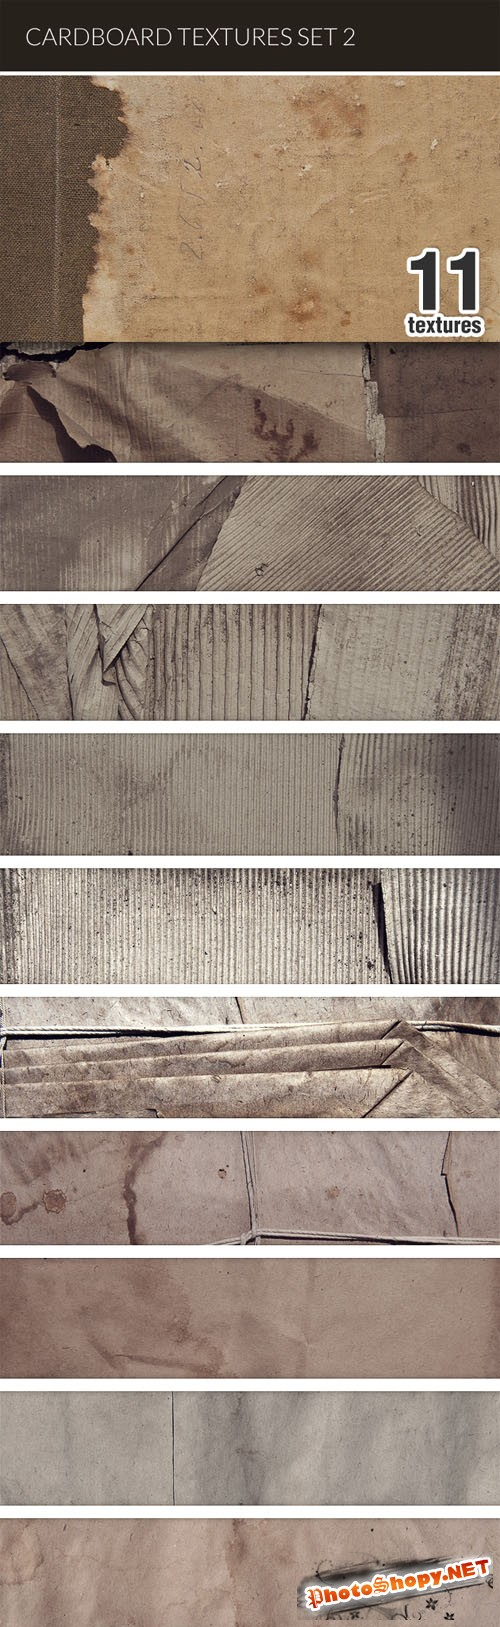 Designtnt - Cardboard Textures Set 2